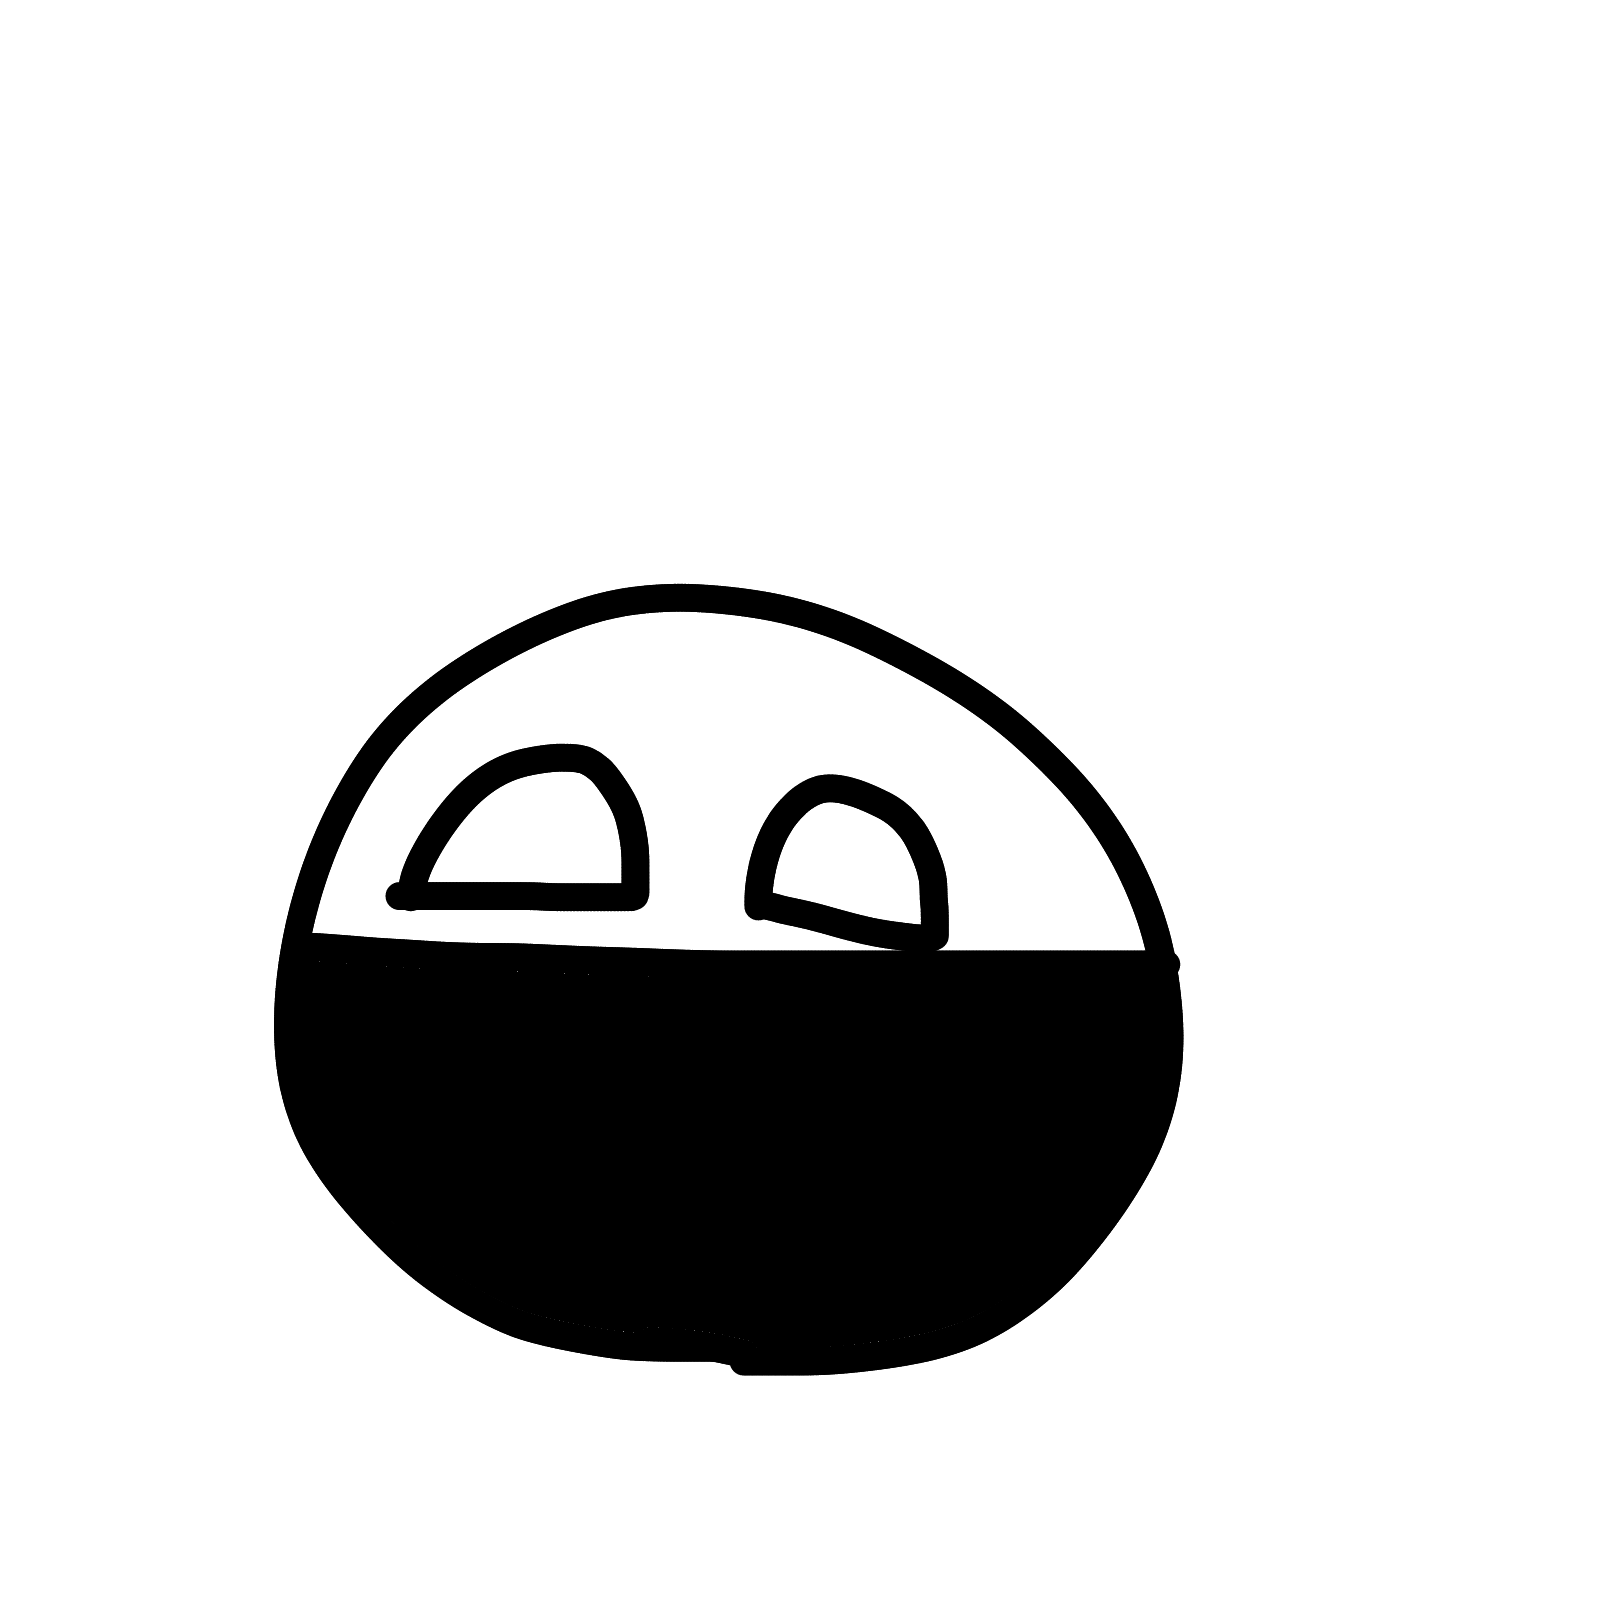 Sienaball